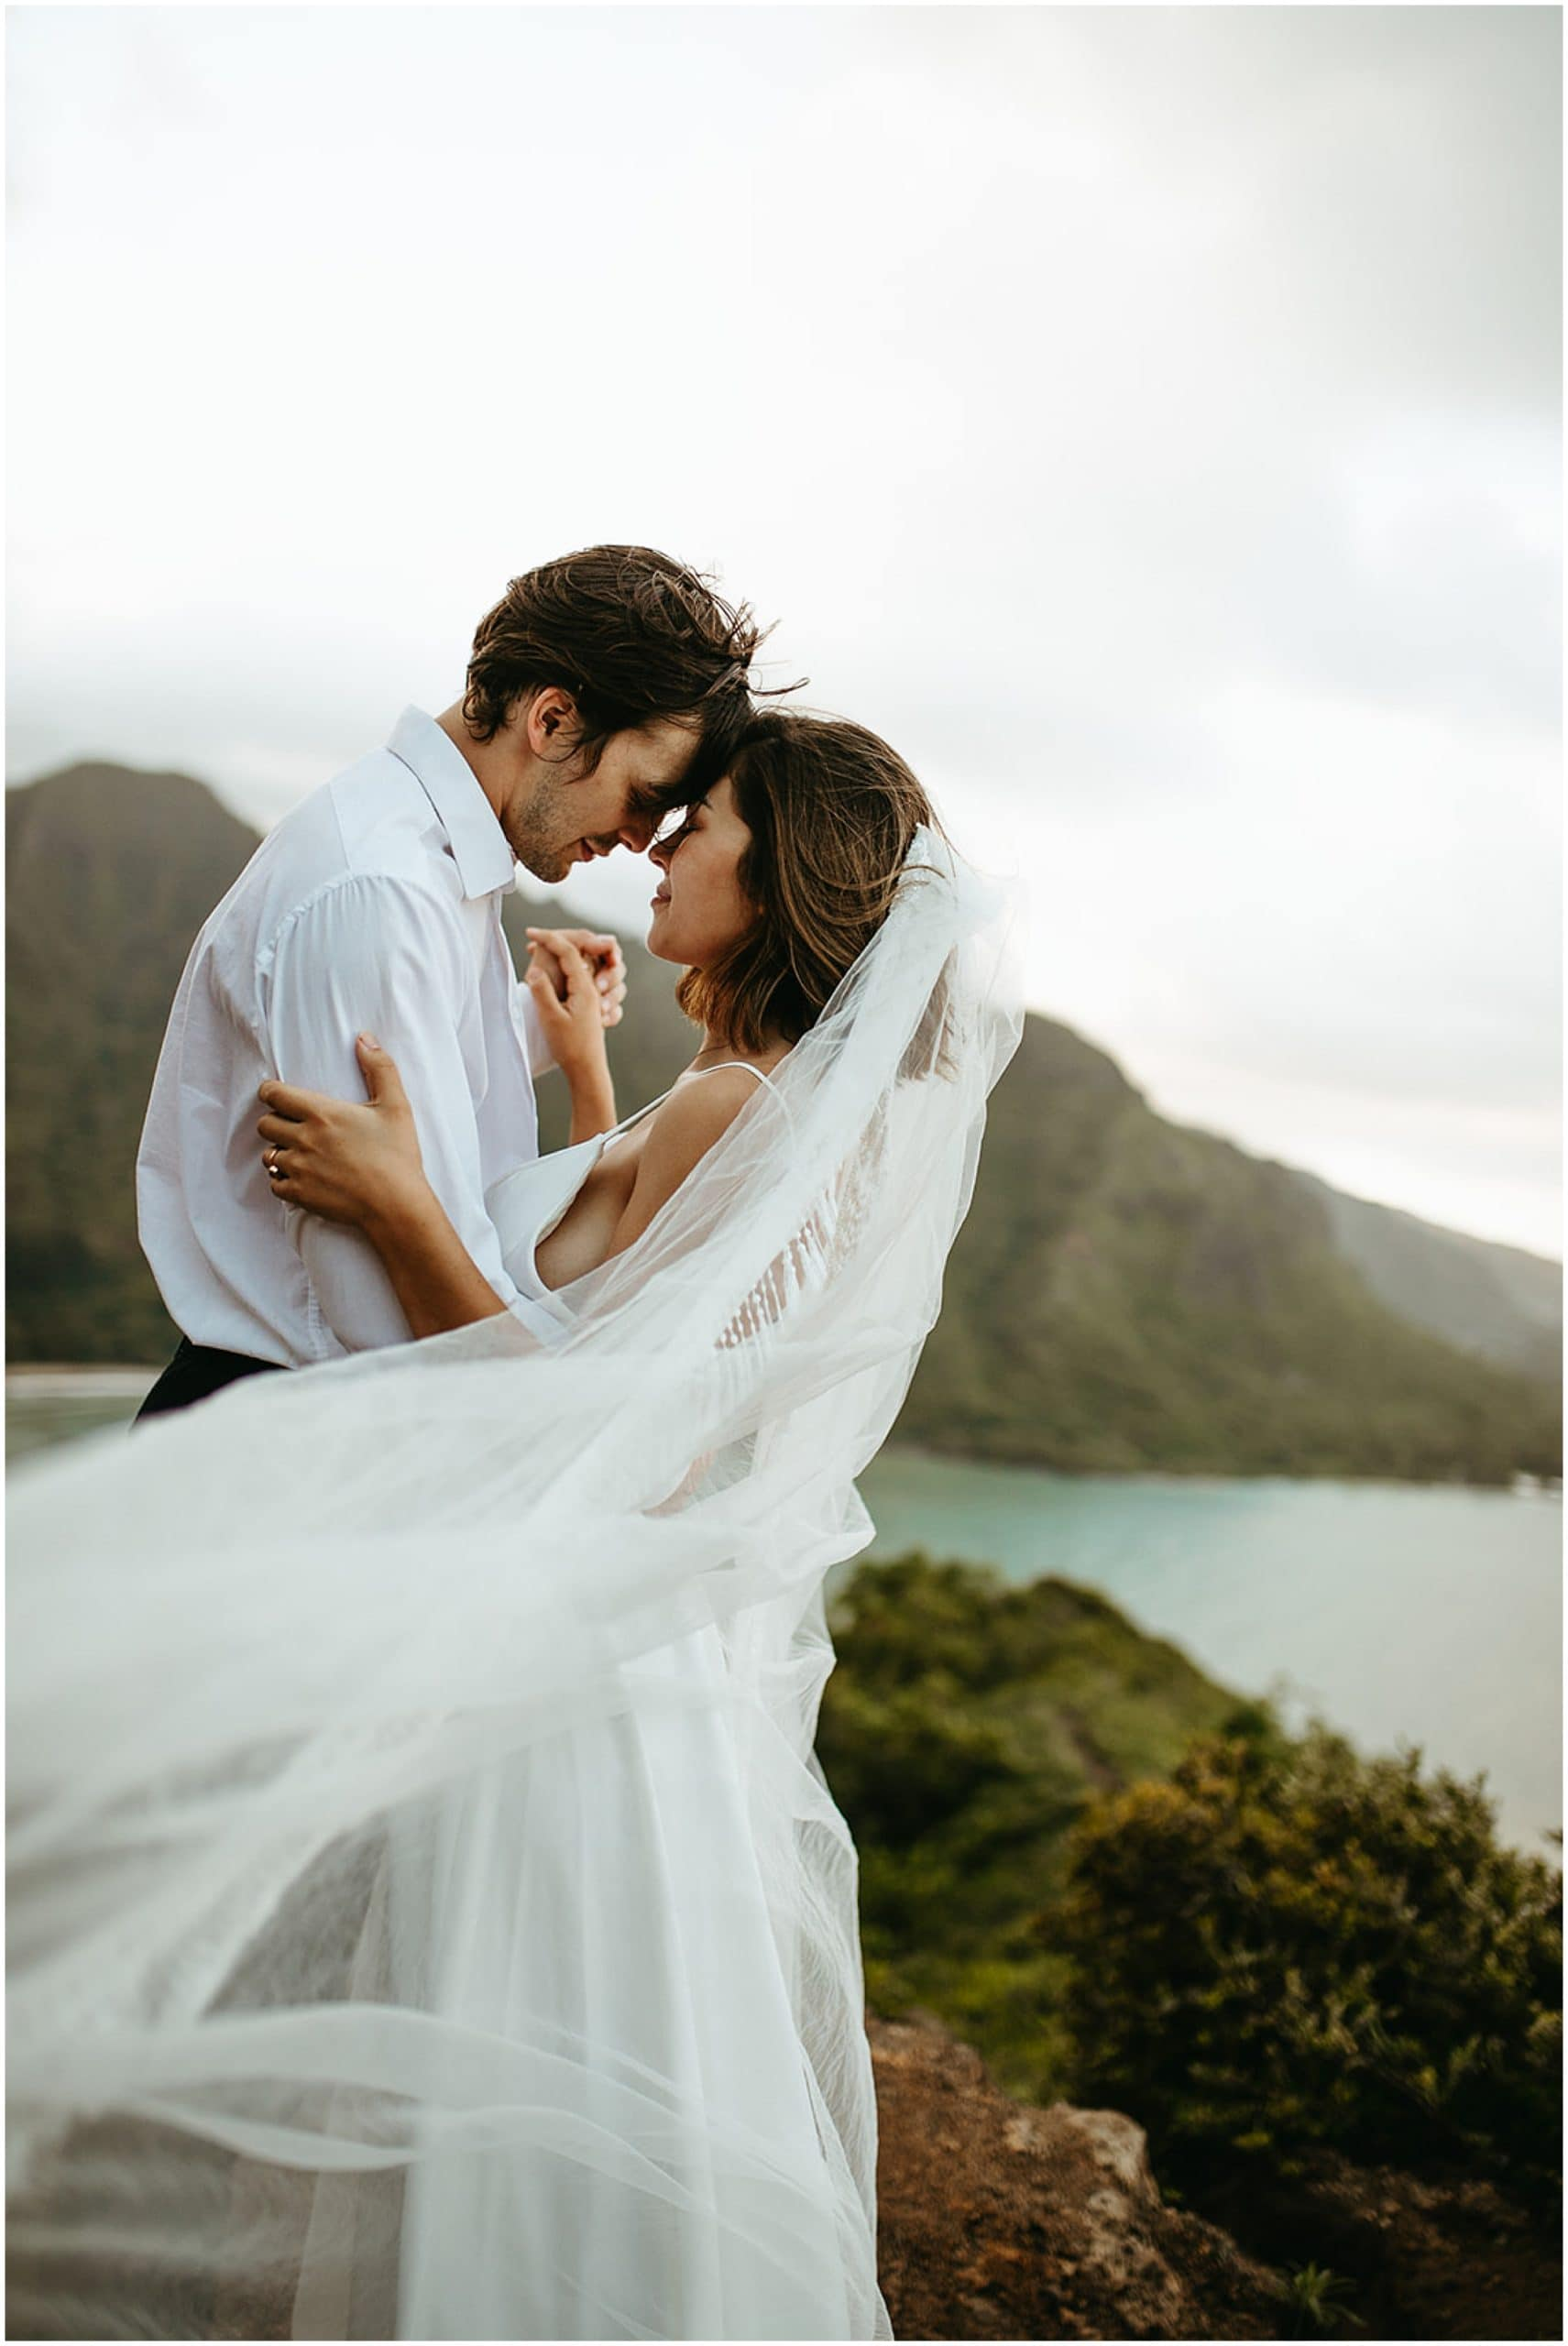 bride's veil blowing in the wind